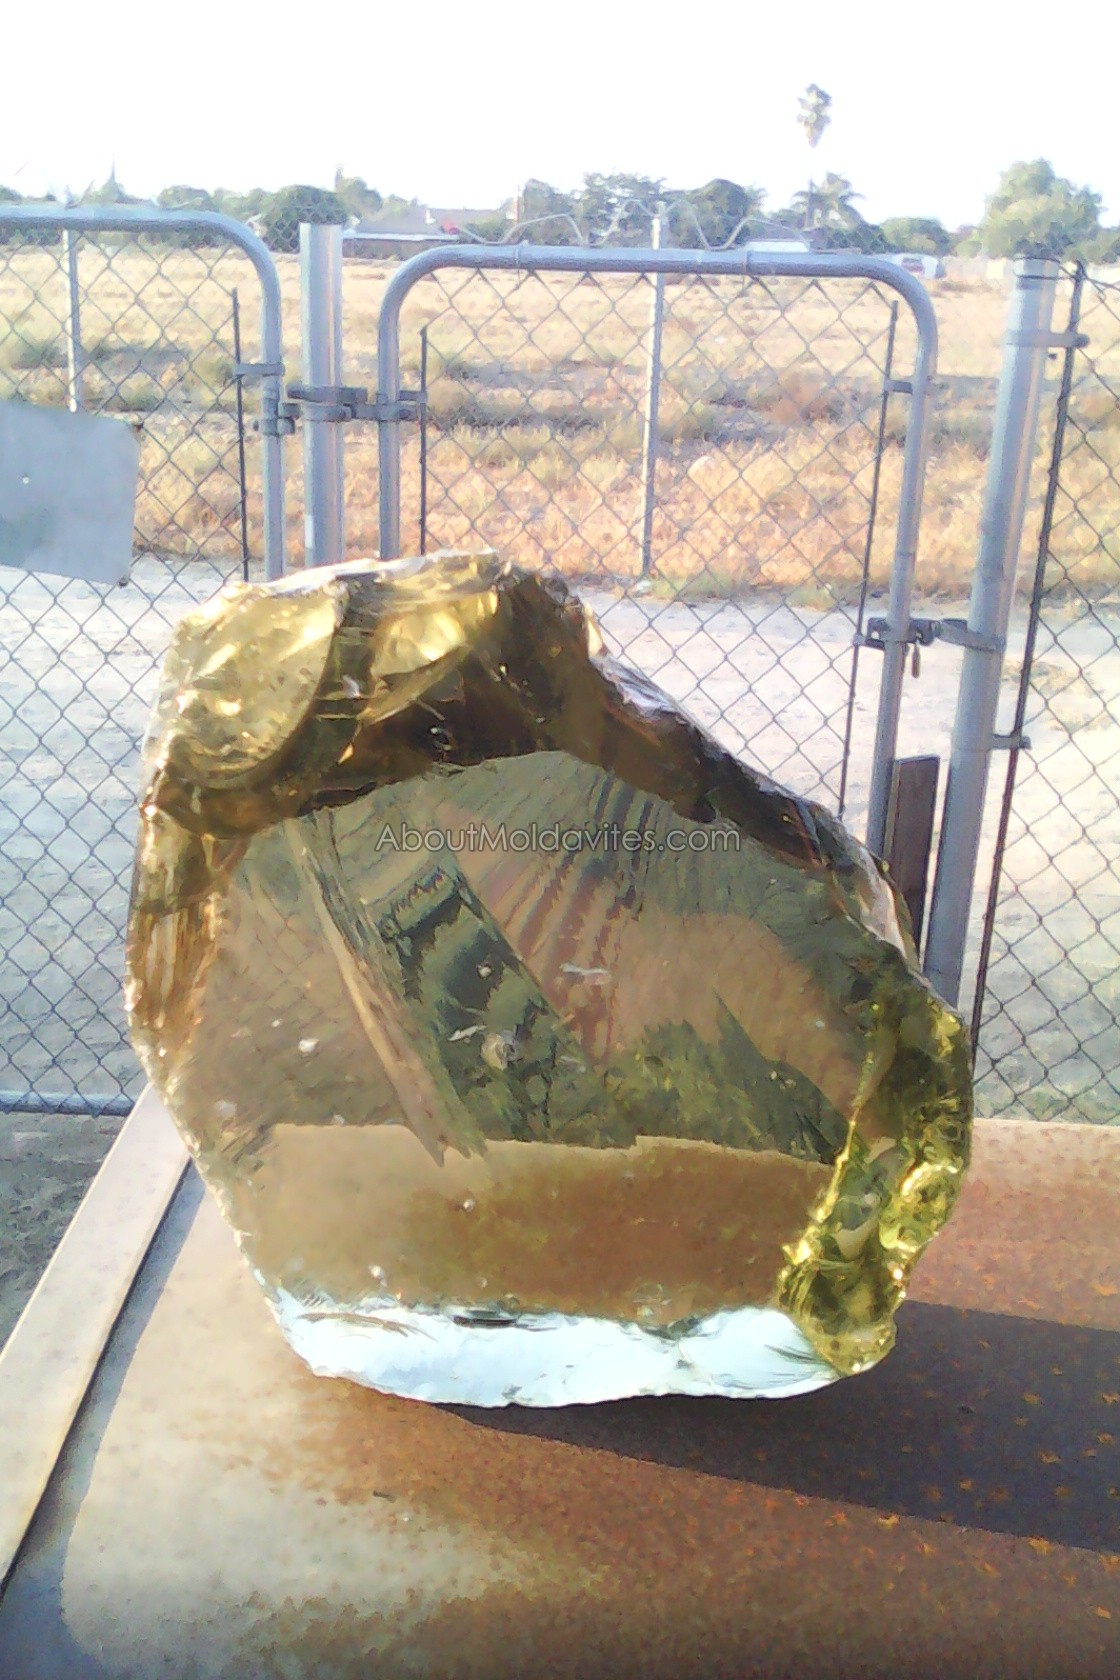 Sample - Is it a moldavite?